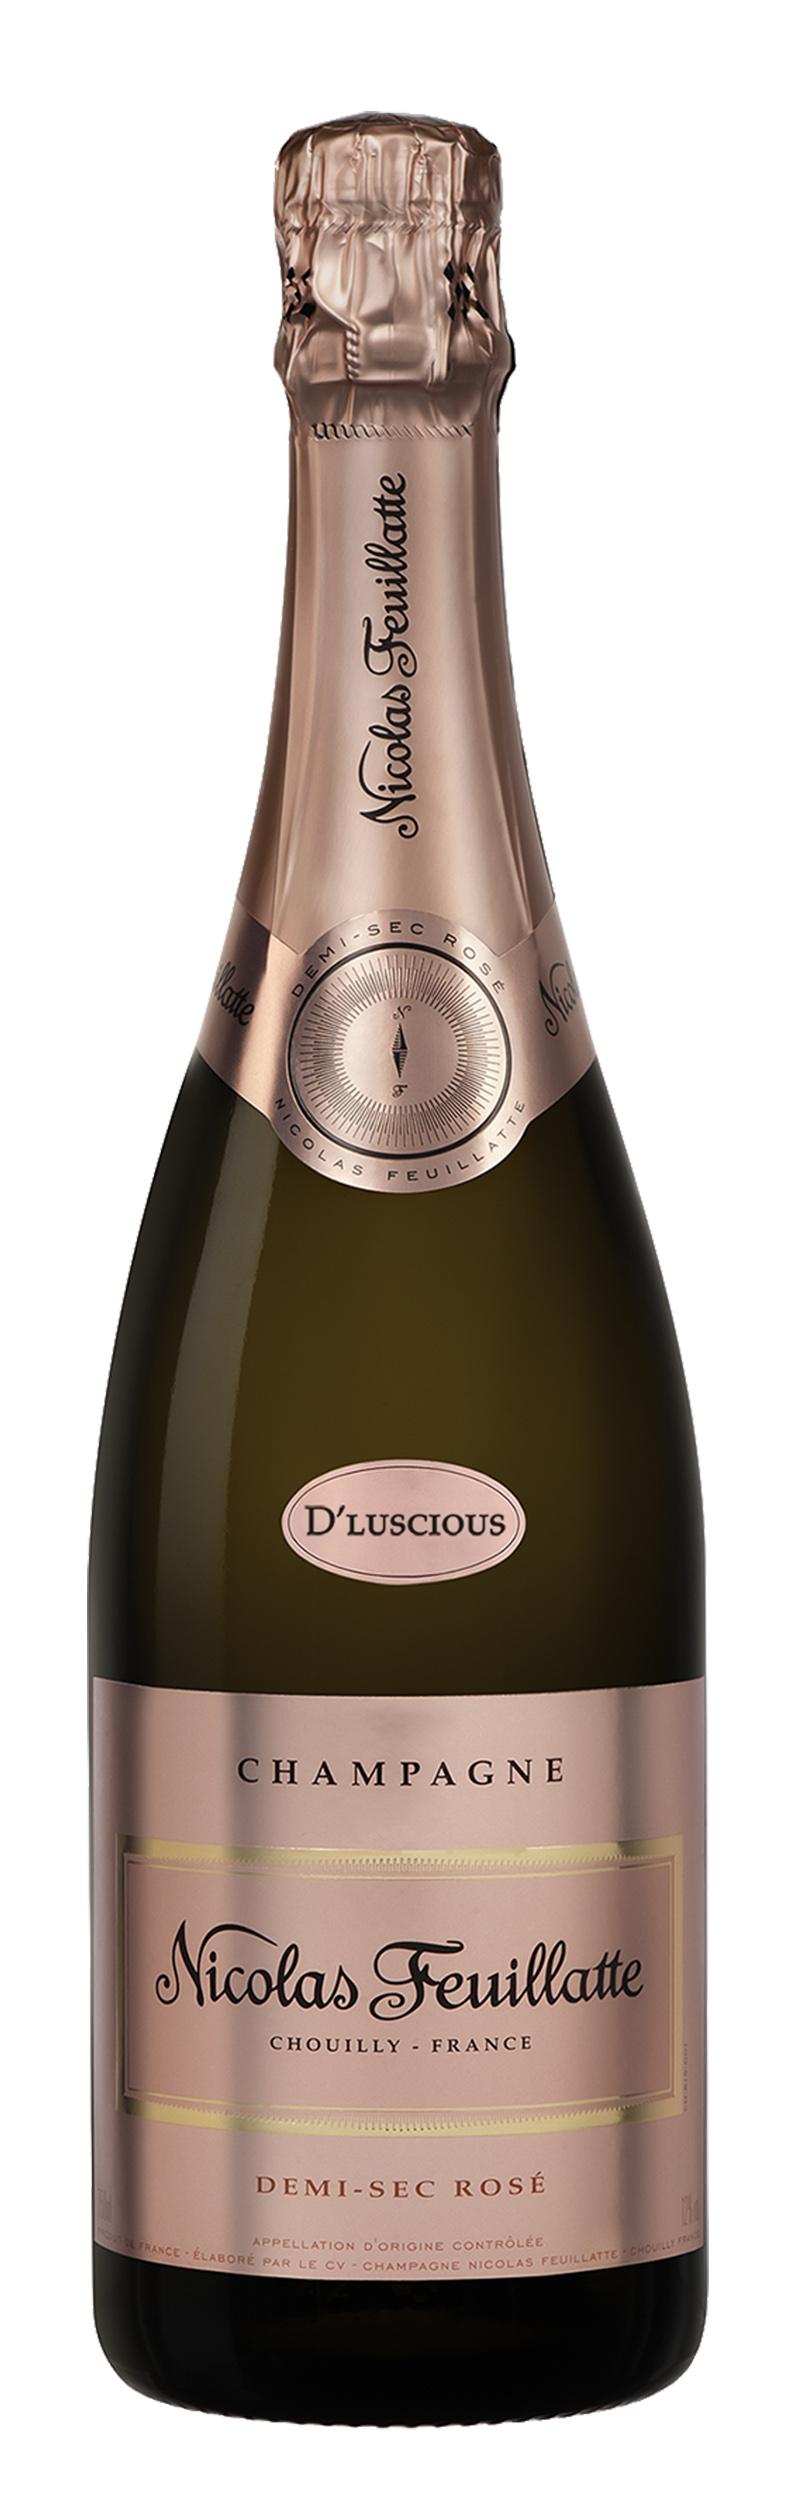 NV Nicolas Feuillatte D'Luscious Demi-Sec Rosé Champagne